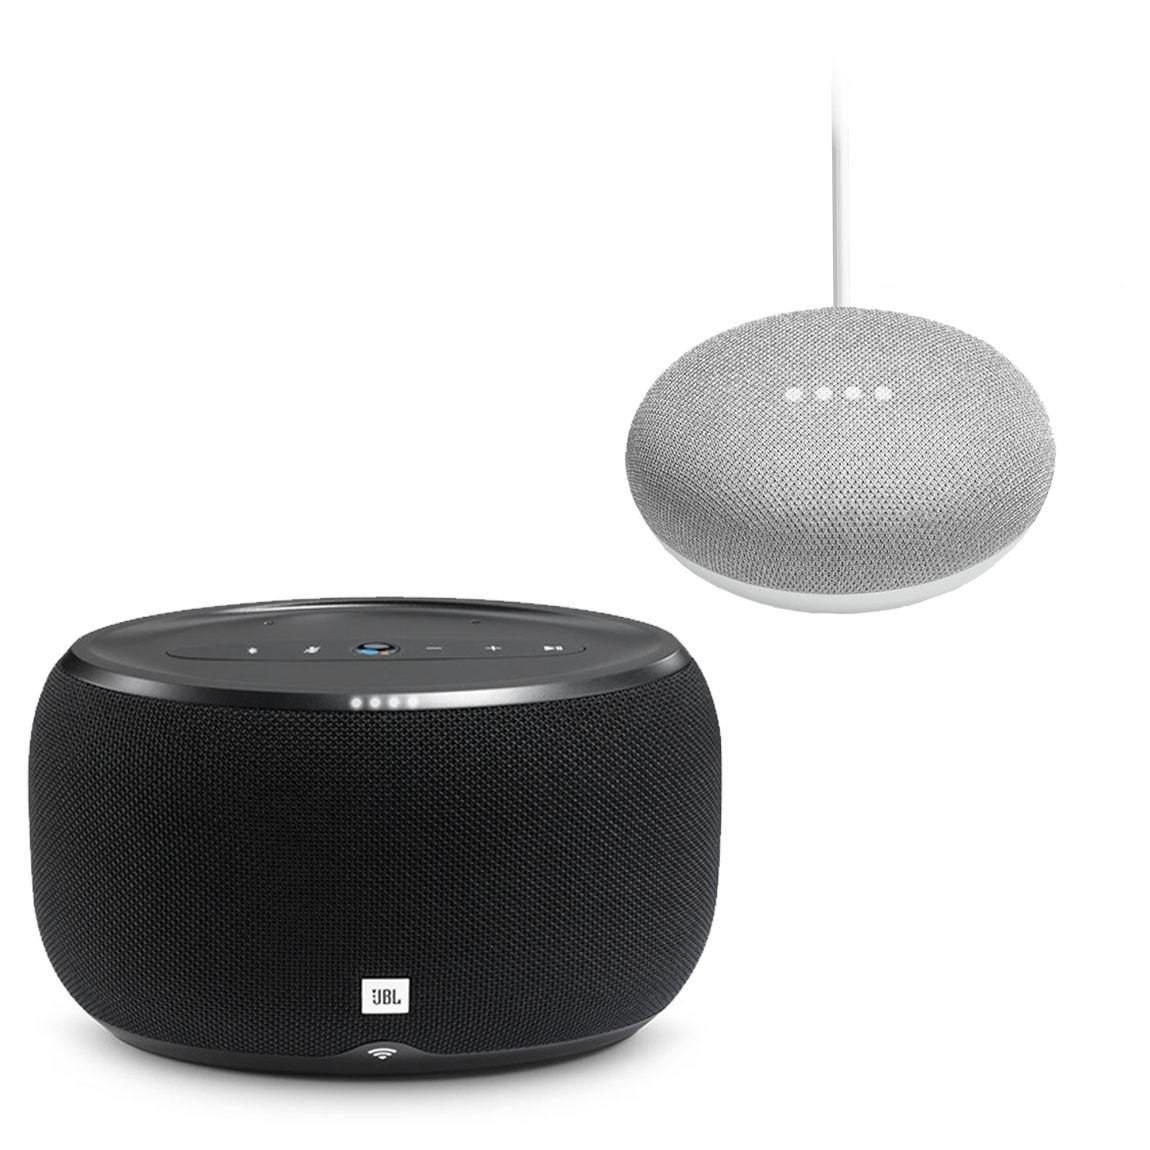 JBL link 300 + Google Home Mini